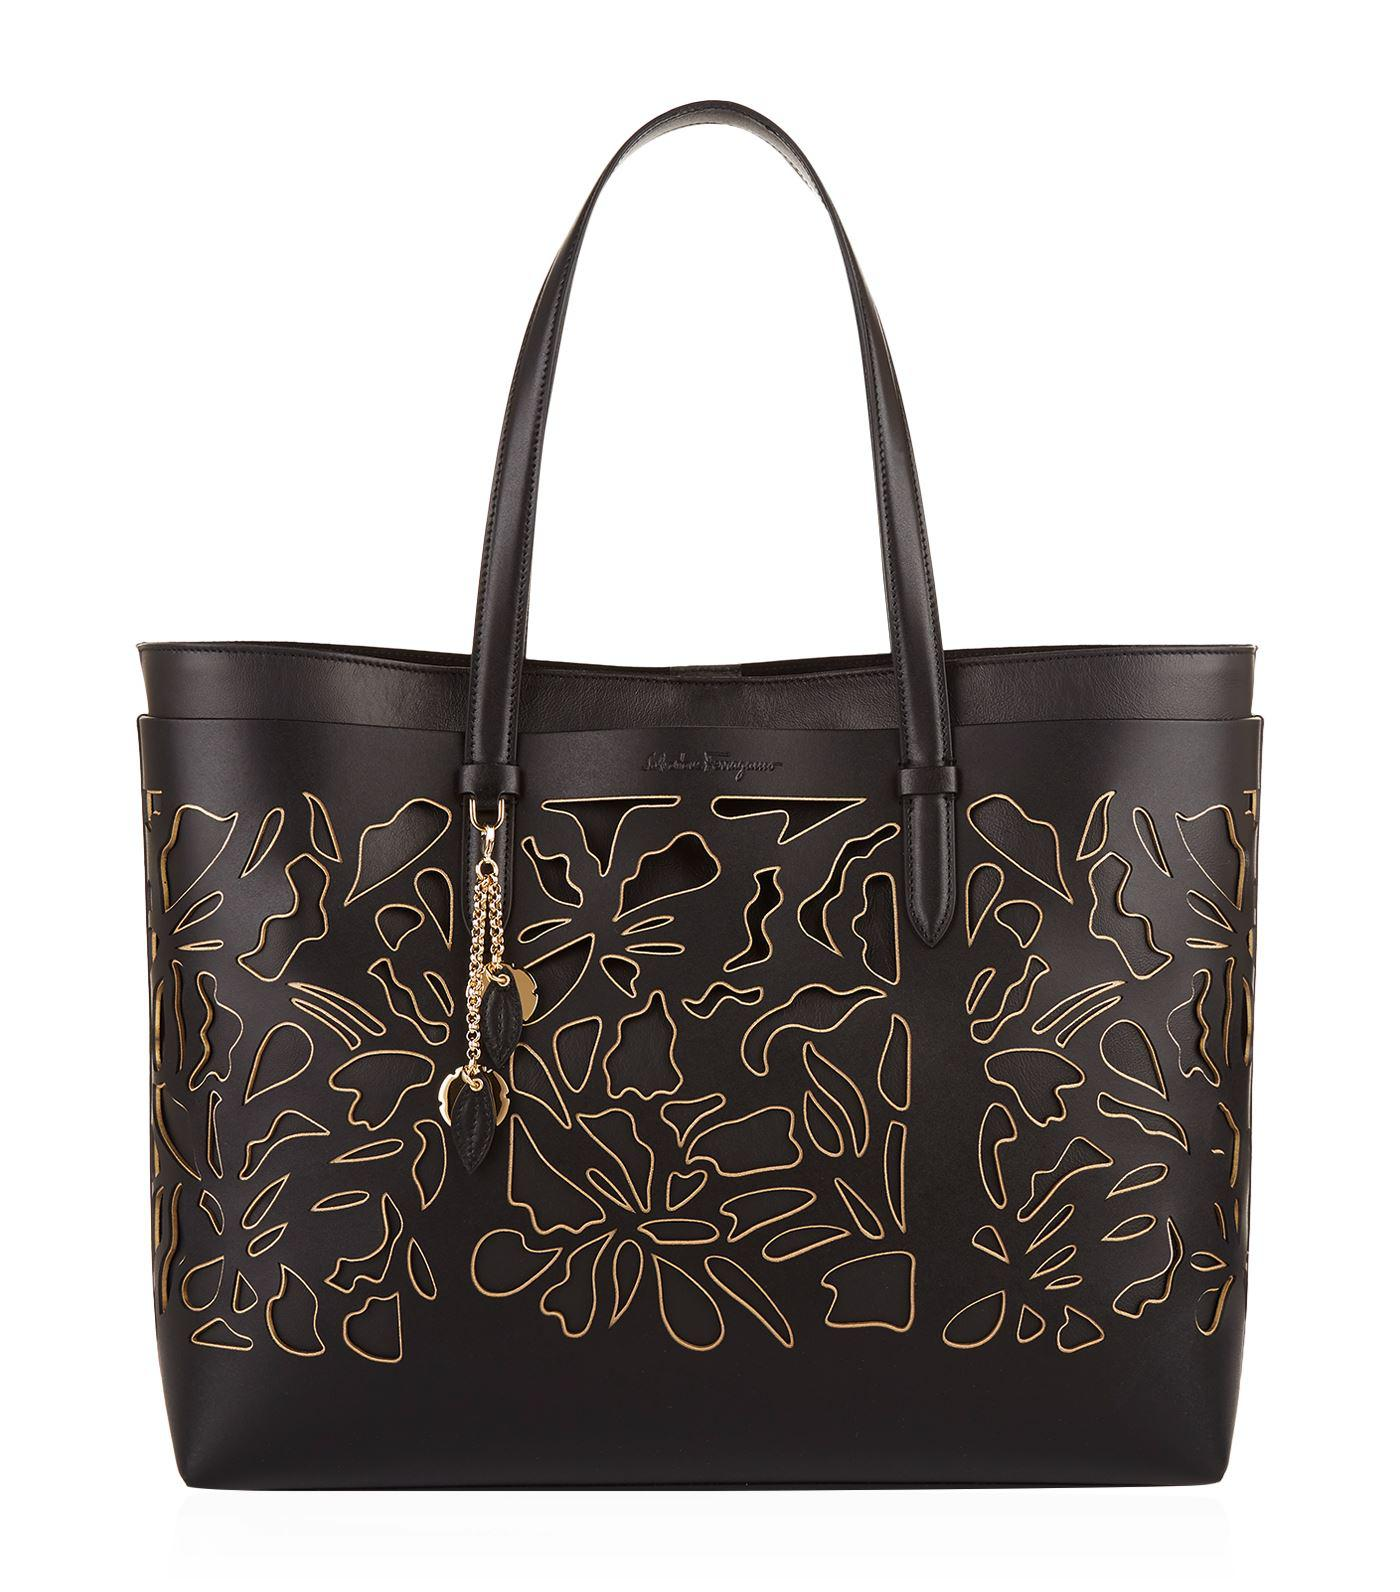 5f0fa74670f8 Ferragamo Large Lana Tote Bag in Black - Lyst